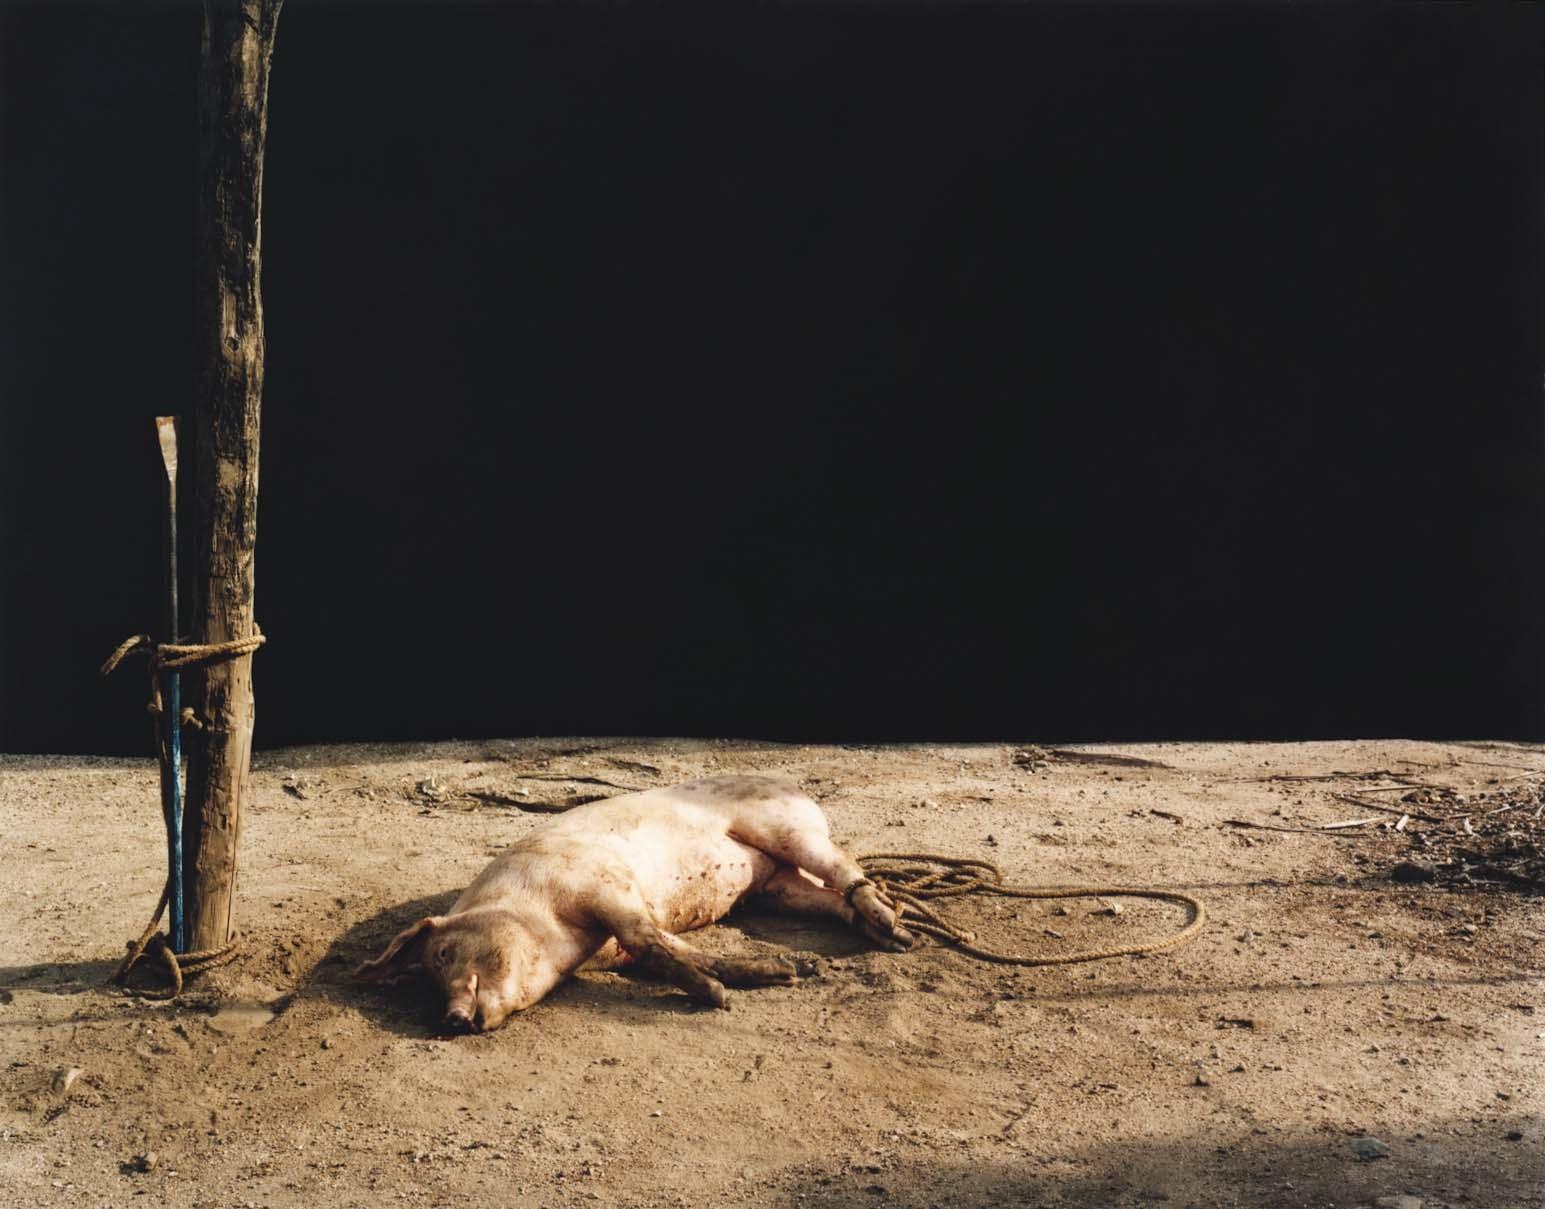 Trevor Appleson,  Death at Sunset , 2007. C-print, 49 1/2 x 62 1/2 inches. © Trevor Appleson.